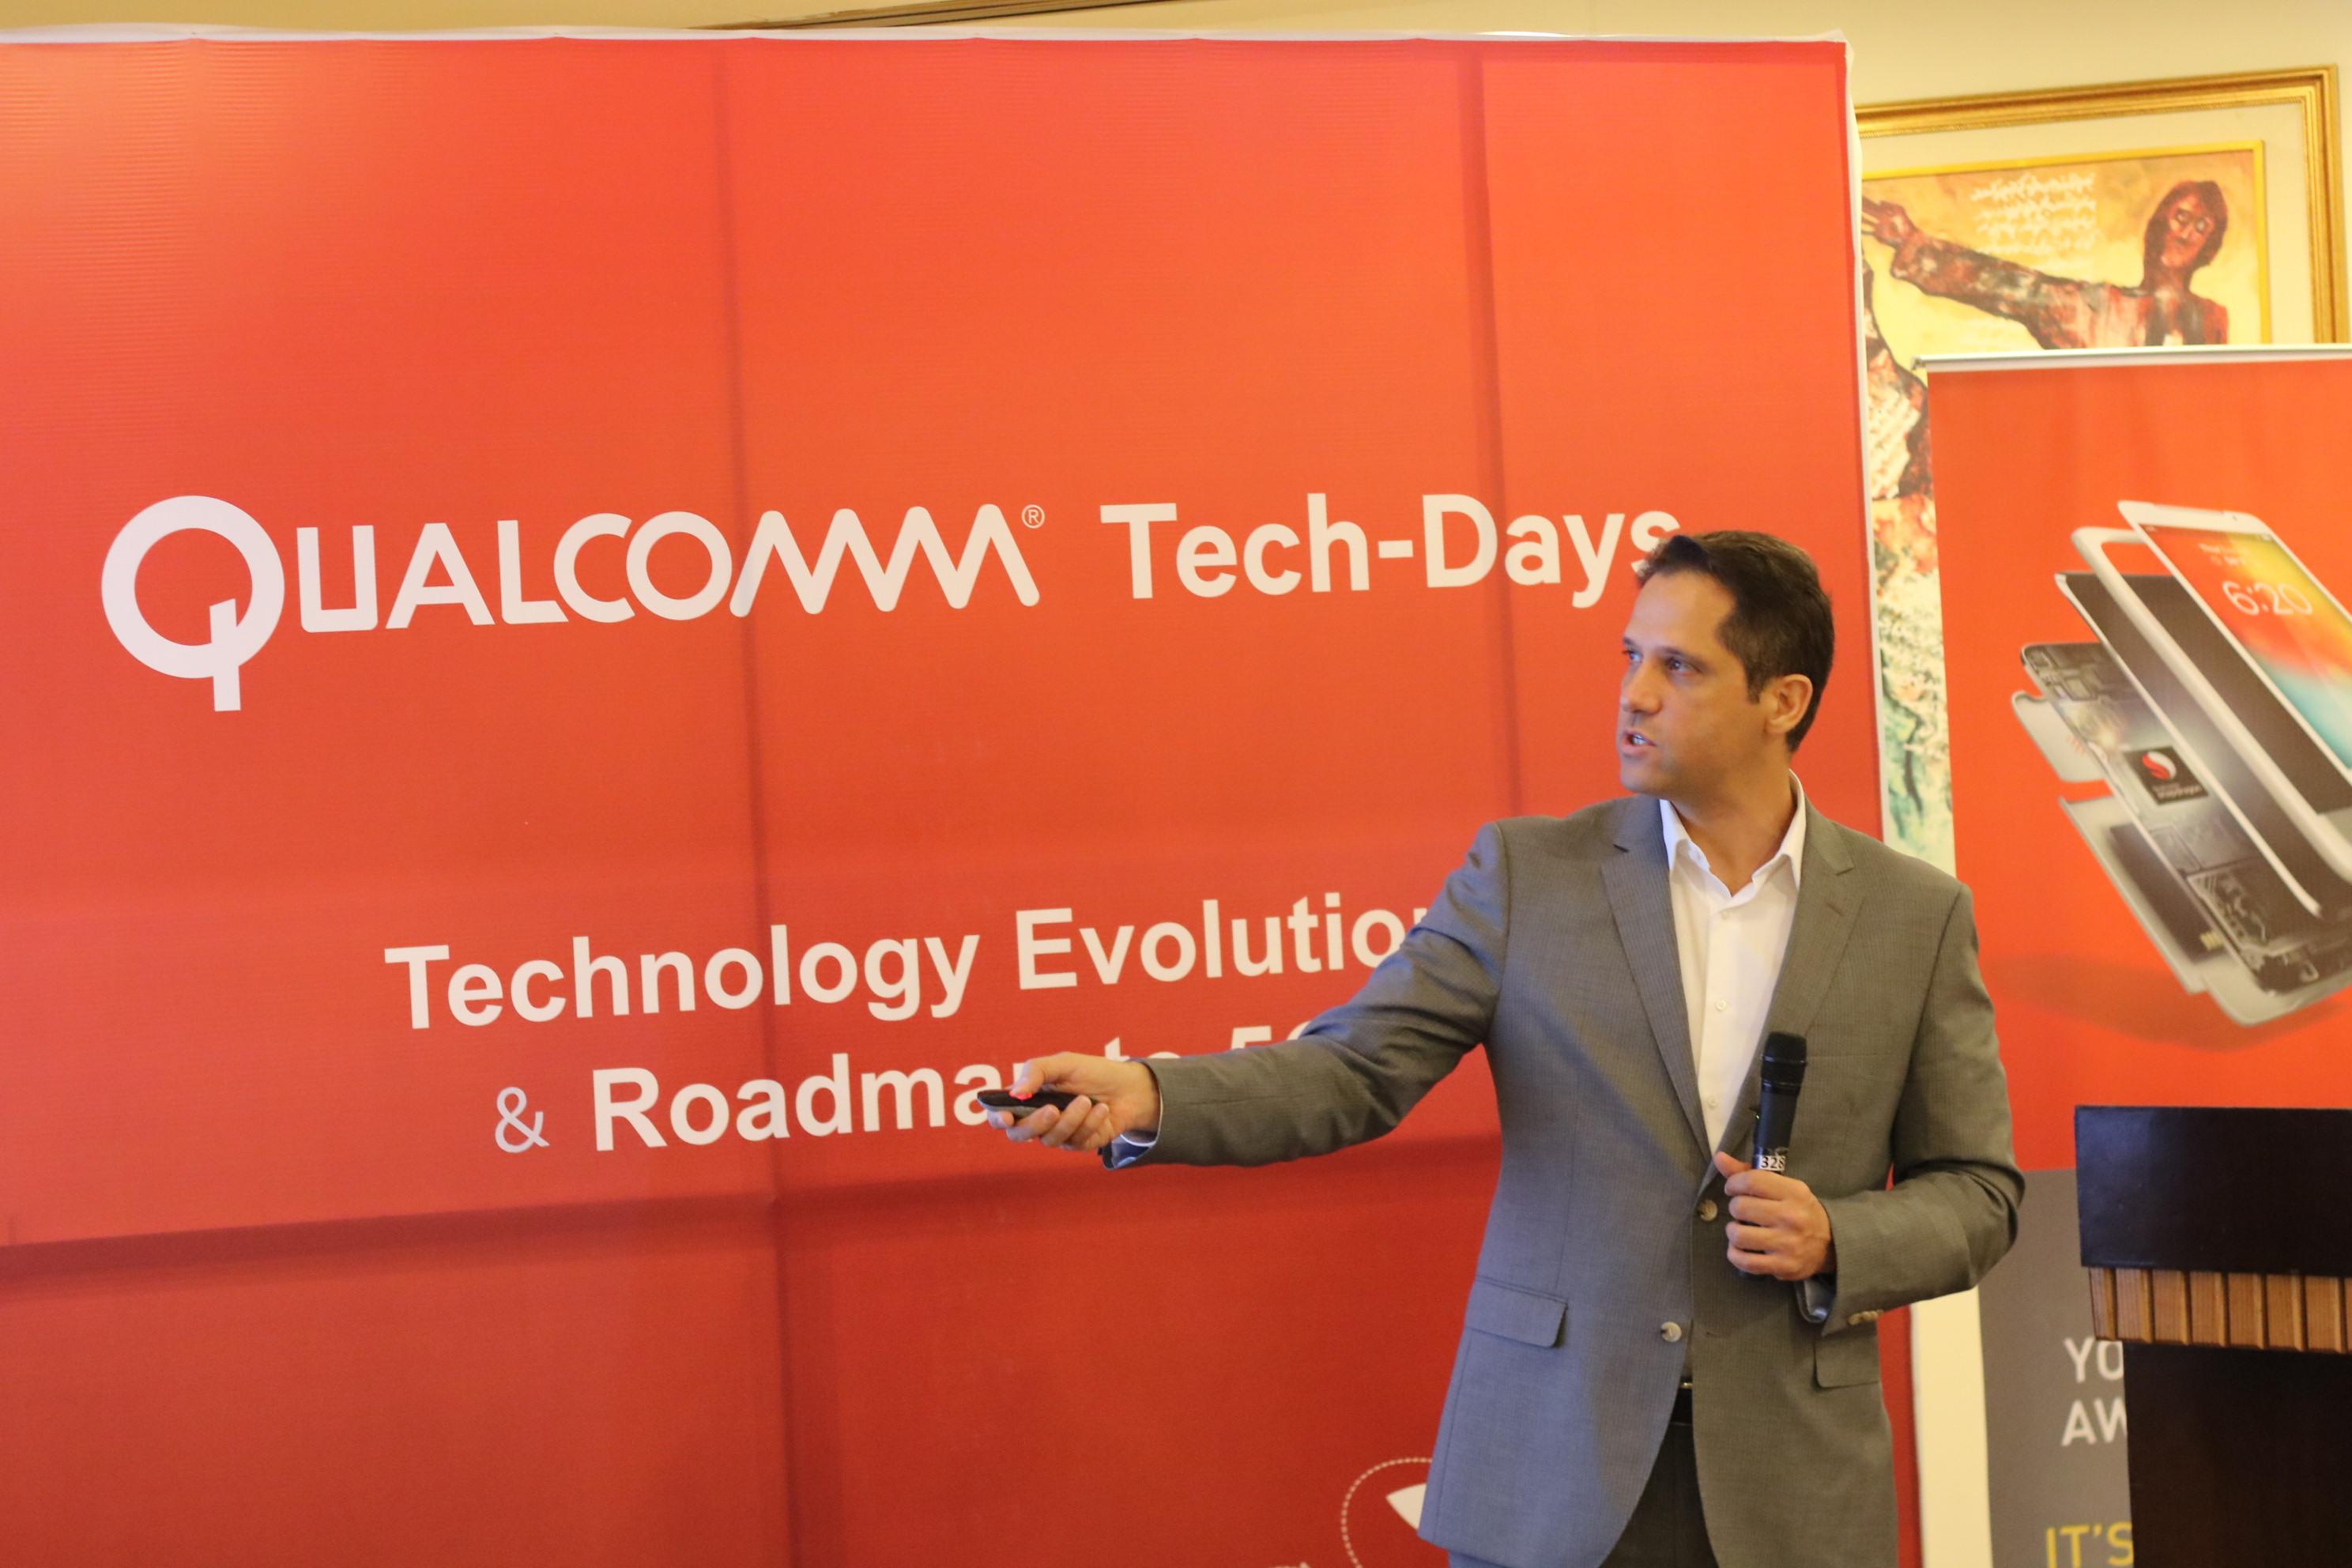 PTA, MoIT & Qualcomm Organizes Workshop on Technology Evolution & Roadmap to 5G